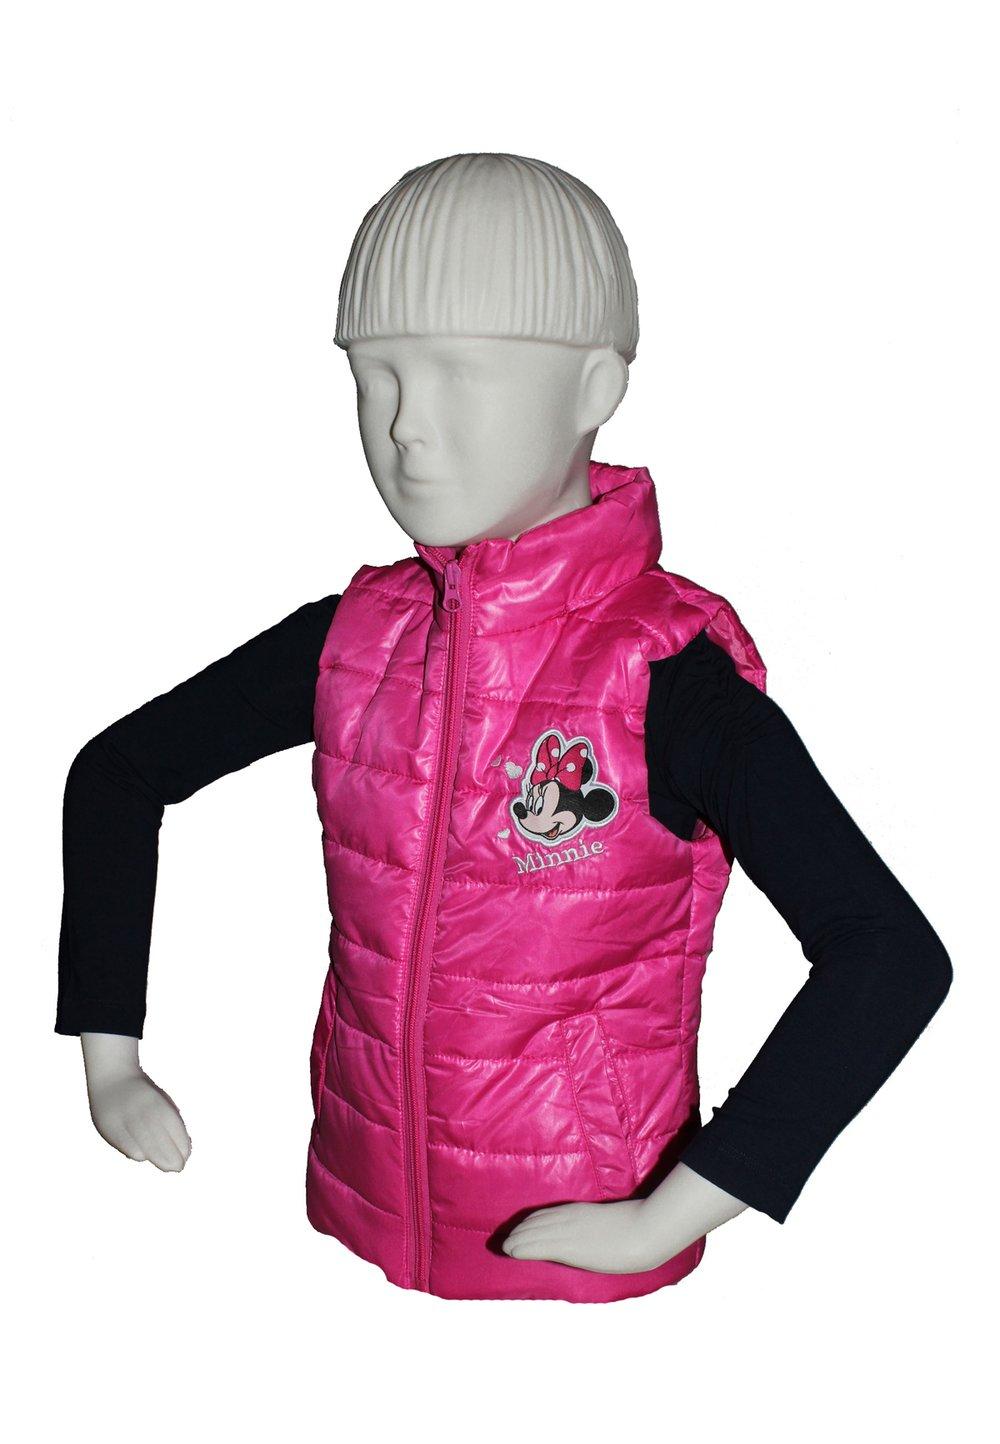 Vesta fas roz Minnie 10681 imagine